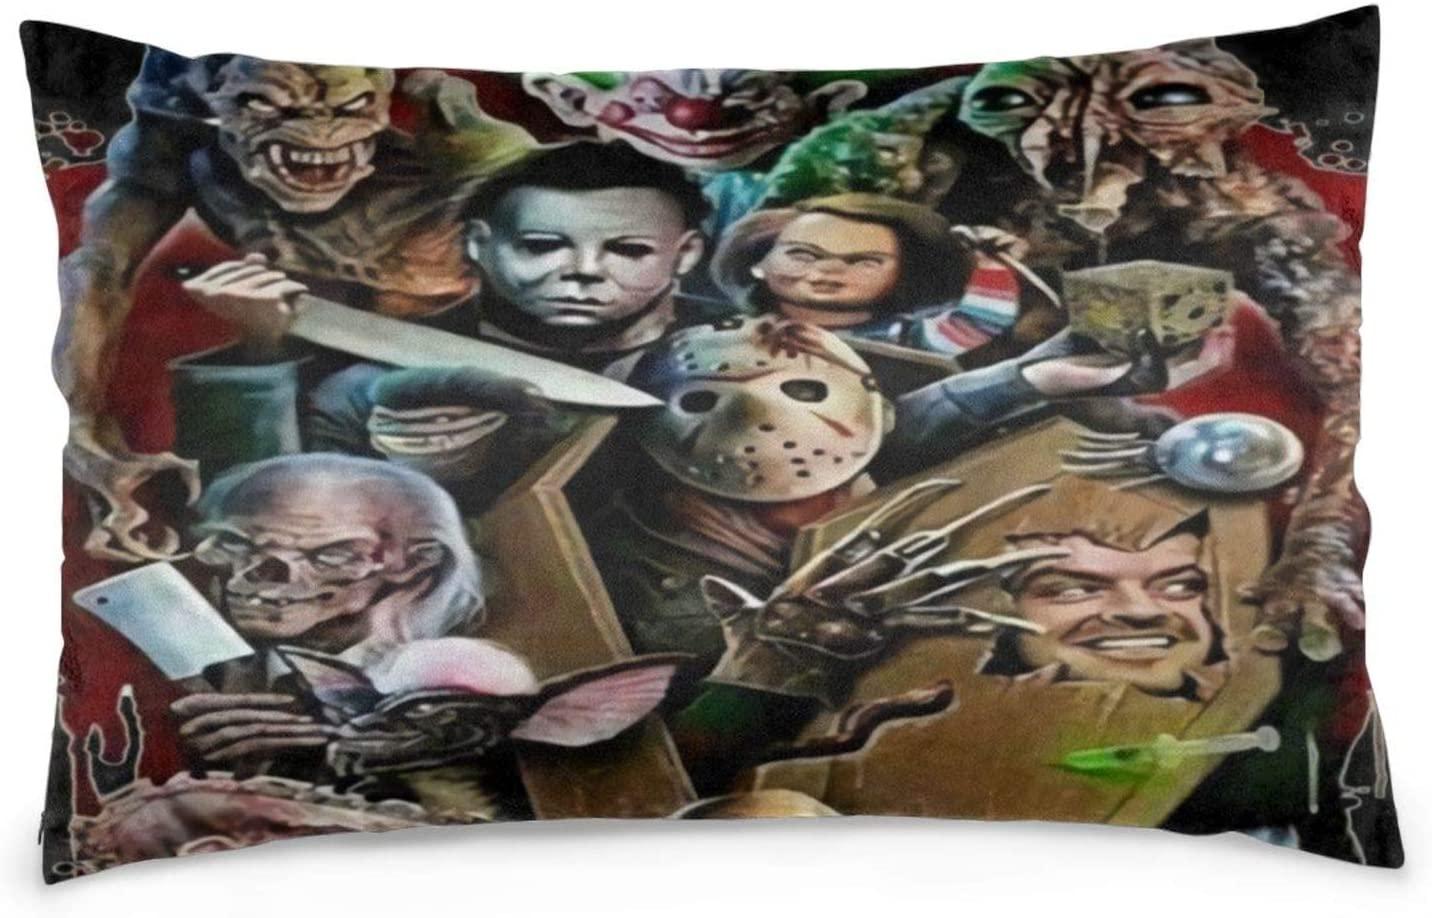 Dawiine Jason Voorhees Michael Myers Halloween Decor Pillowcases Pillow Protectors Pillow Cases Bedroom Home Car Decor